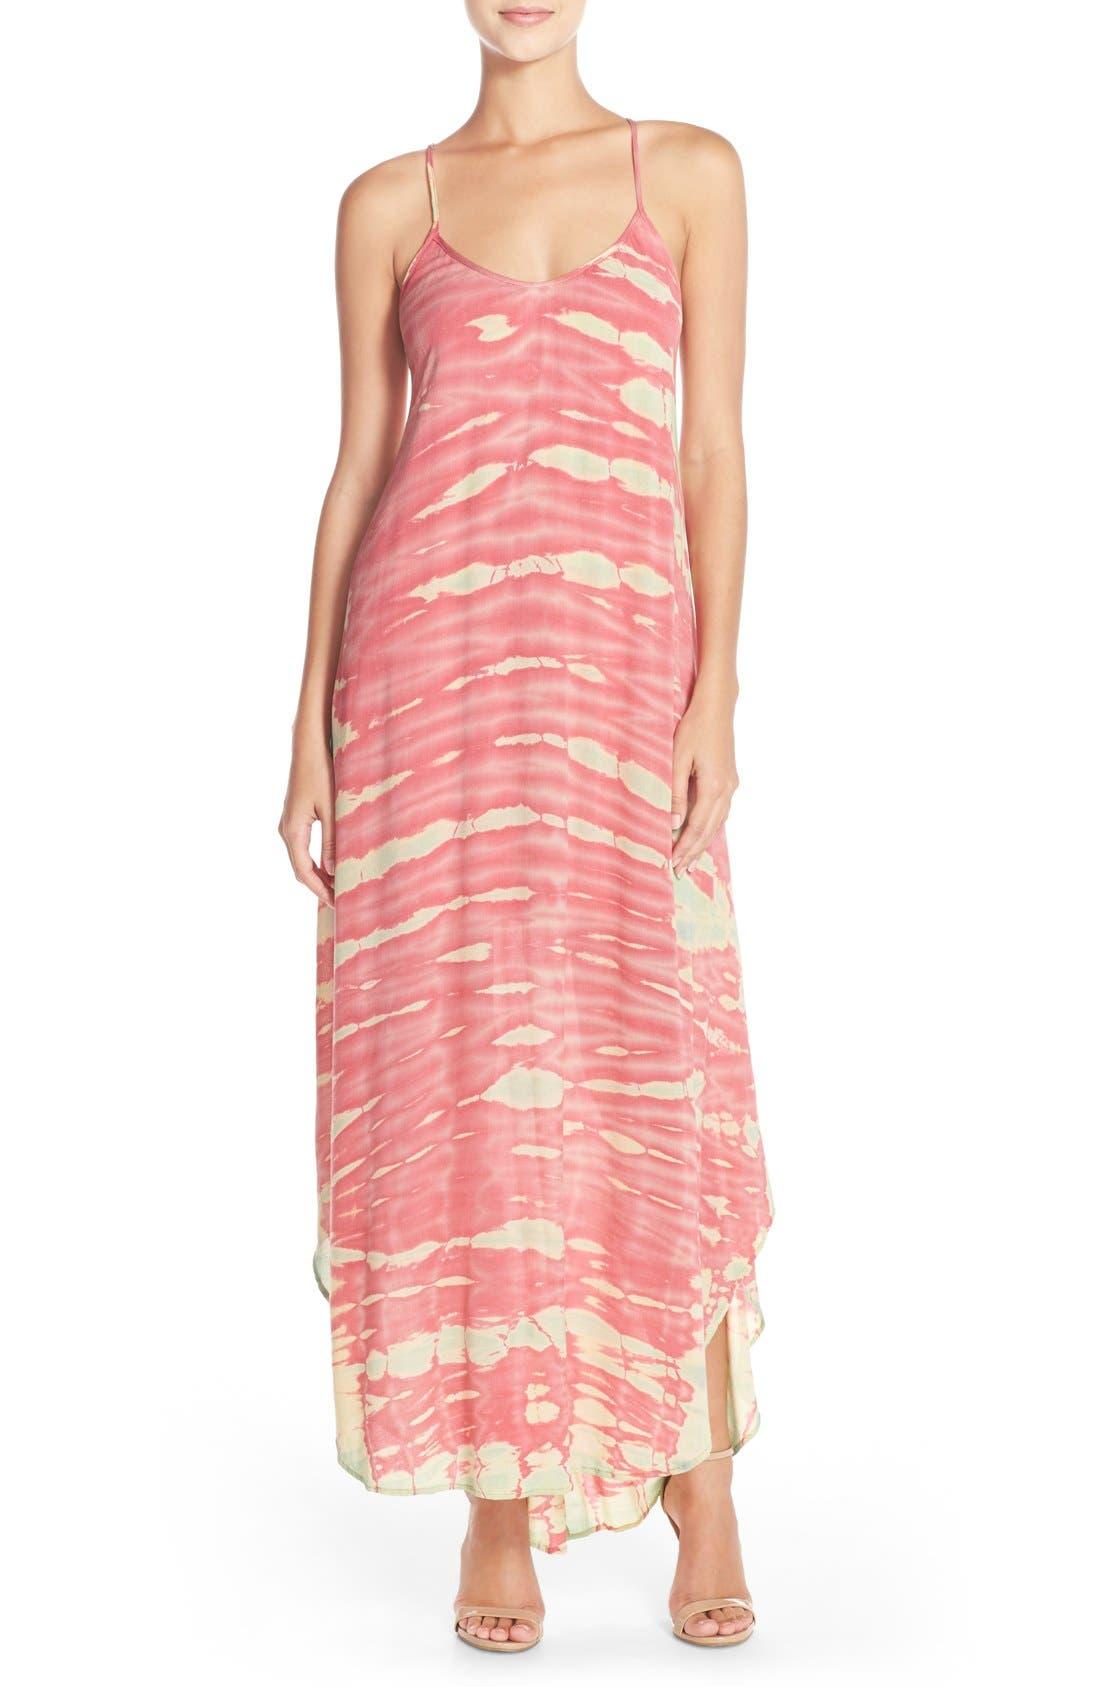 Tie Dye A-Line Maxi Dress,                             Main thumbnail 1, color,                             Pink/ Mint Special